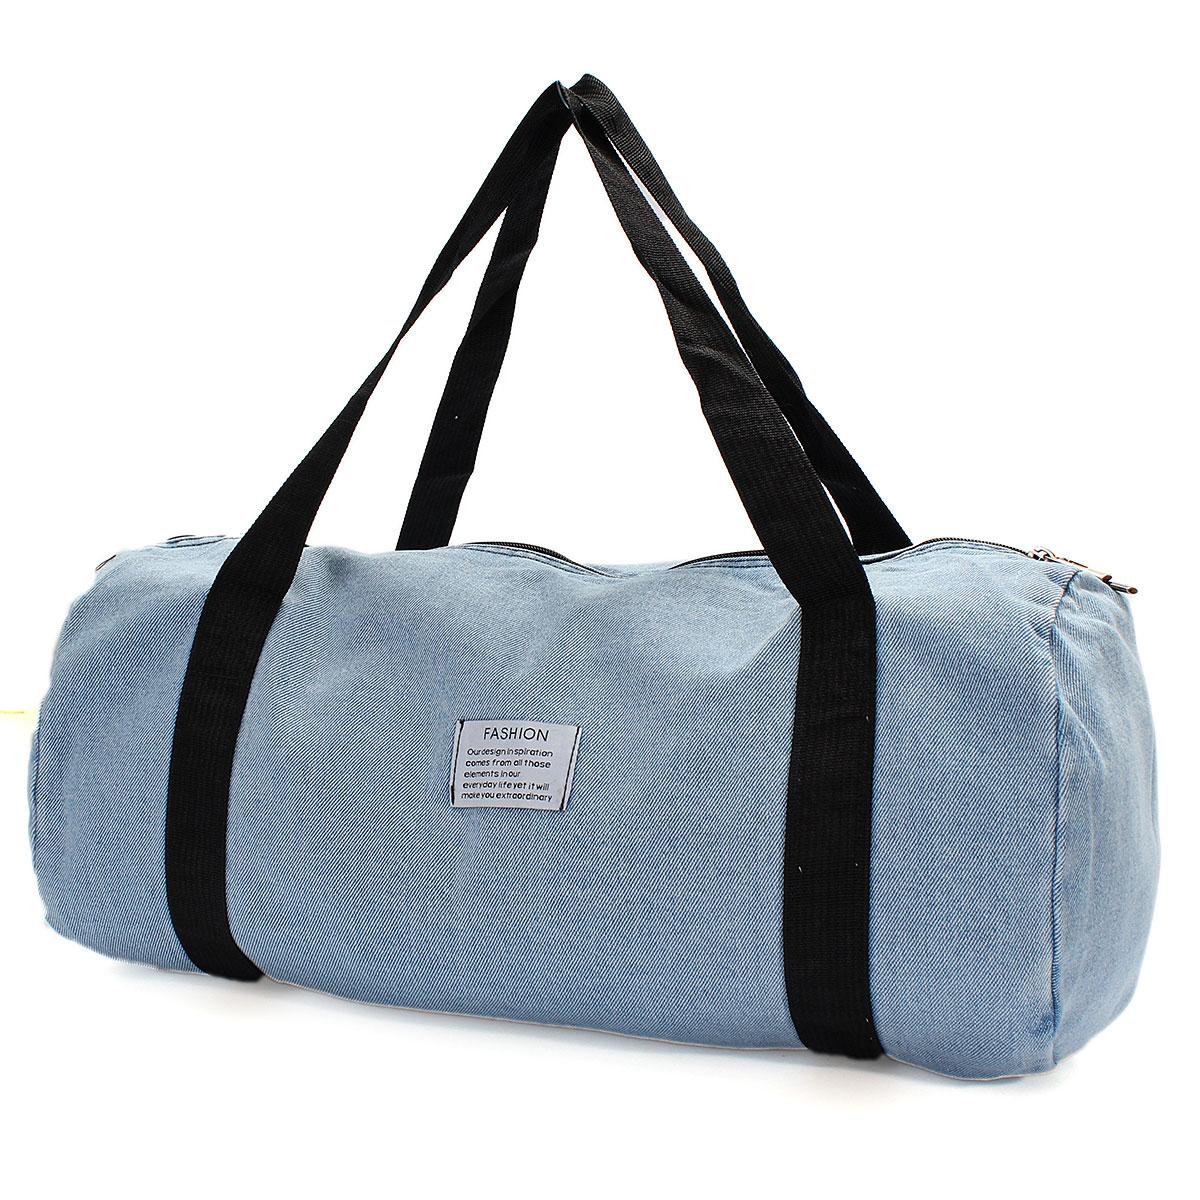 Travel Duffel Bags for Mens and Womens Fashion travel duffel bags